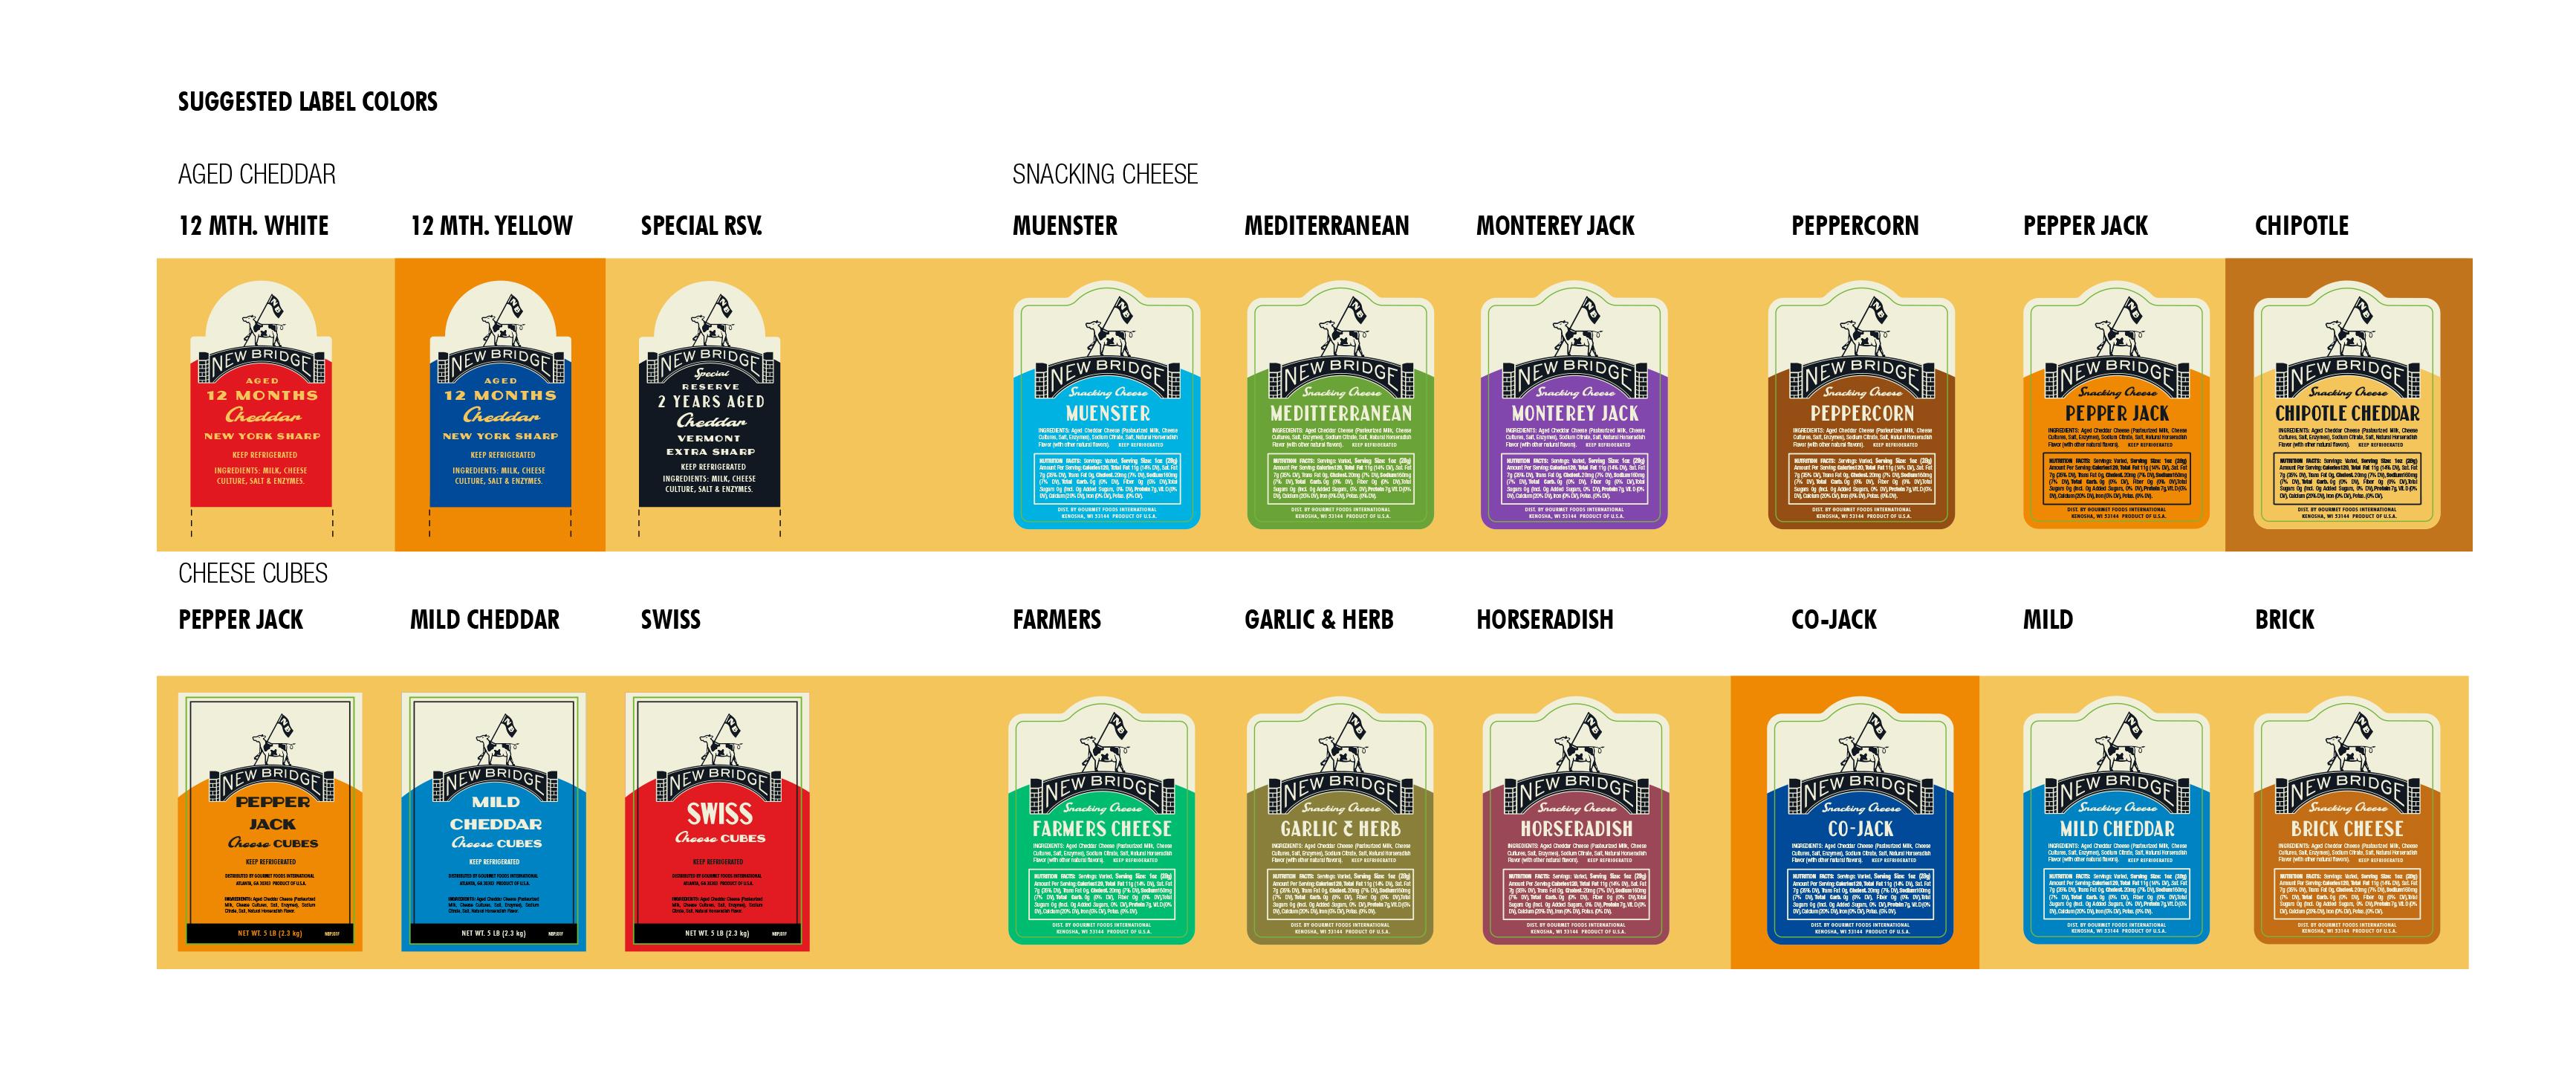 packaging-guideline-new-bridge-cheese-design-exploration-zeki-michael-design-cheese-cow-spread-tub-sku-range-agency-branding copy